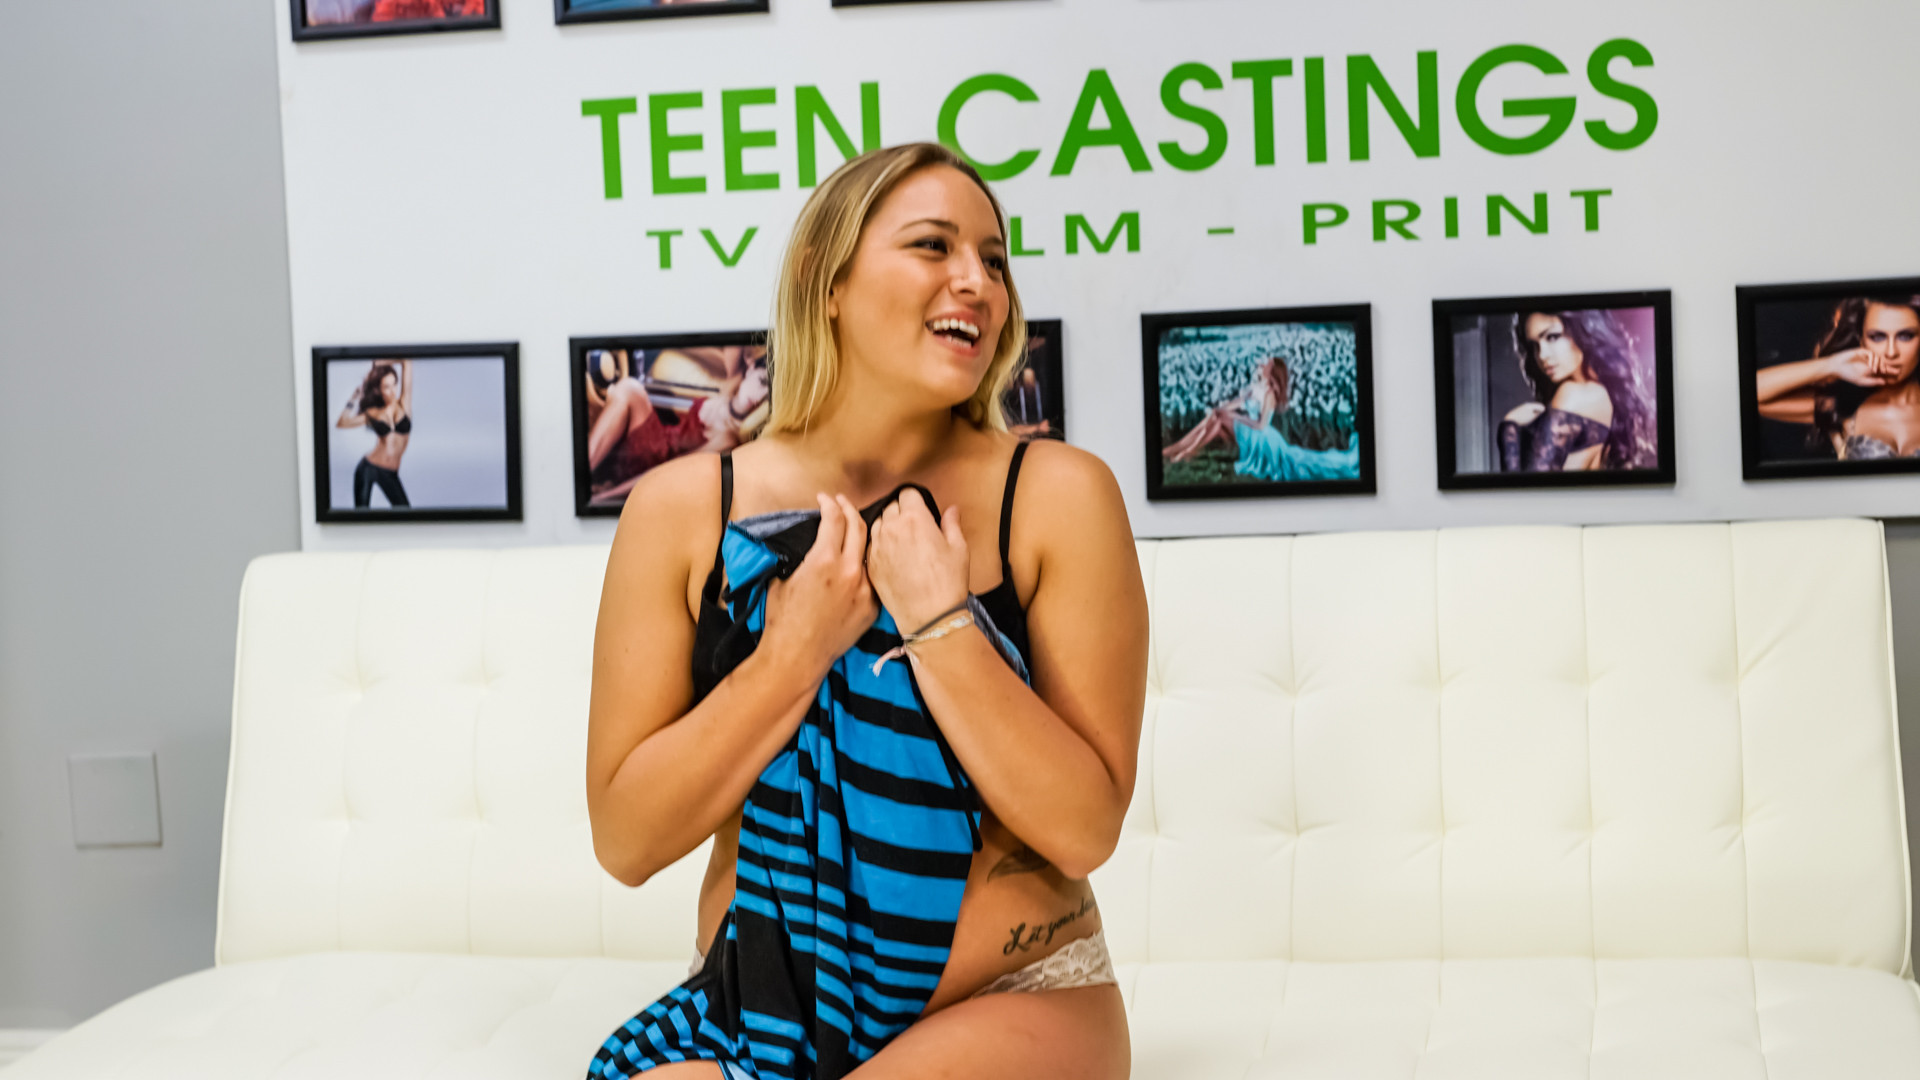 Scarlett Jennings - Глубокая глотка - Порно галерея № 3525421